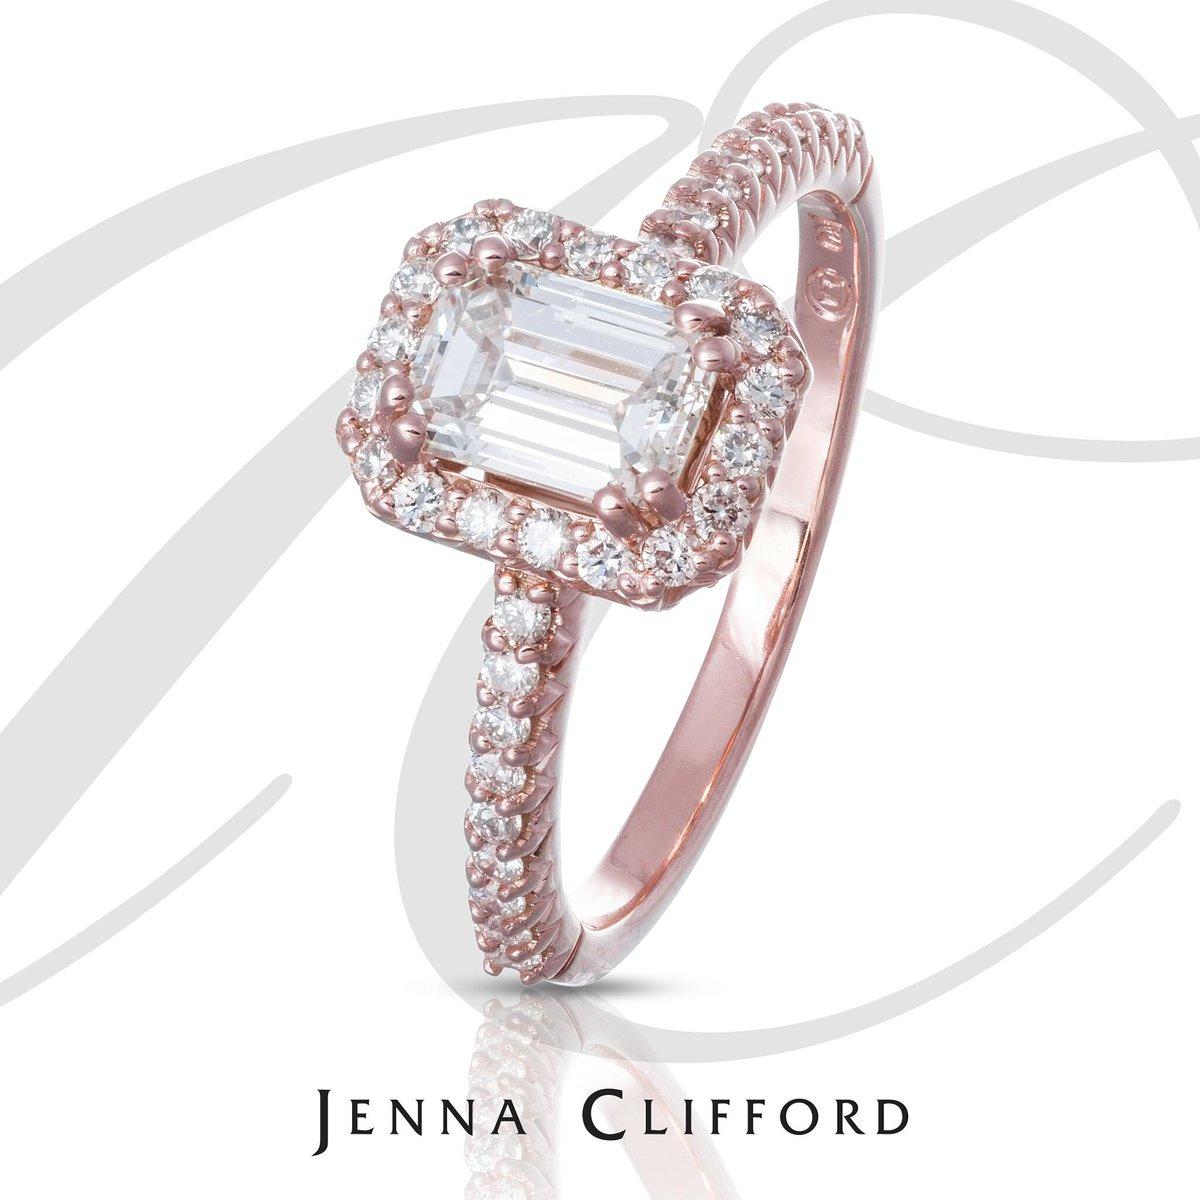 58dece96180cc Jenna Clifford on Twitter: